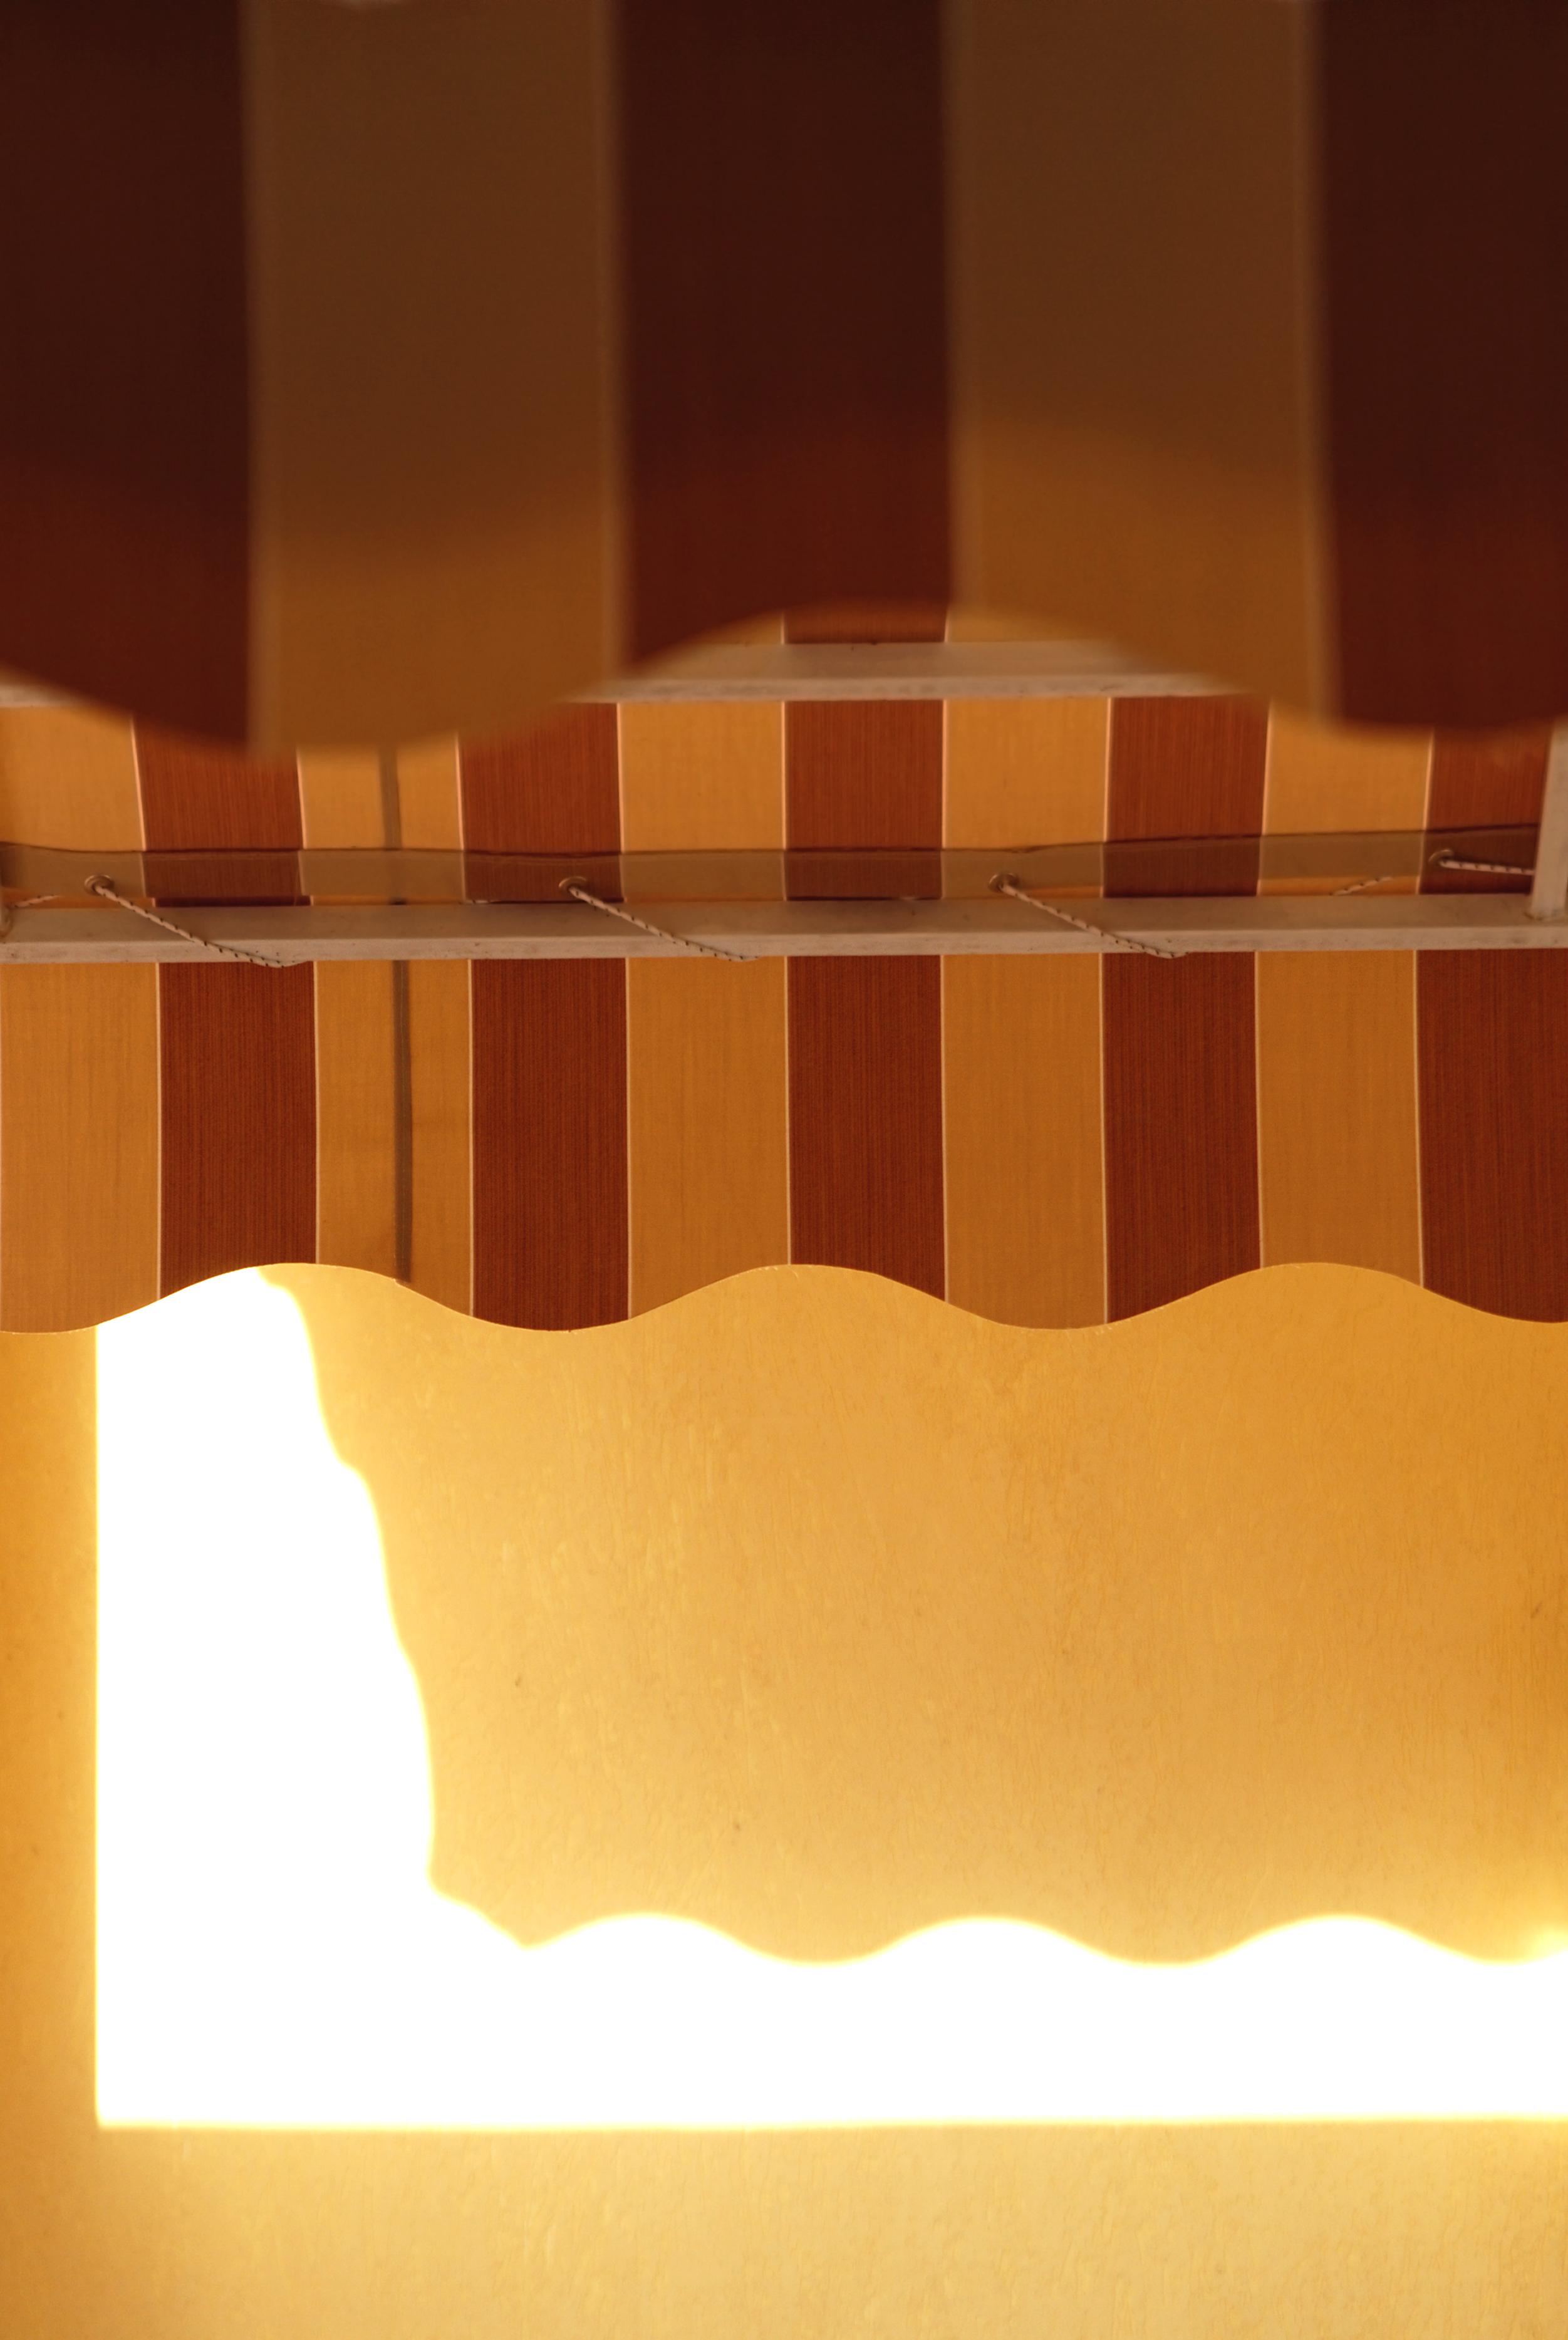 Product Spotlight: Sunesta Awnings